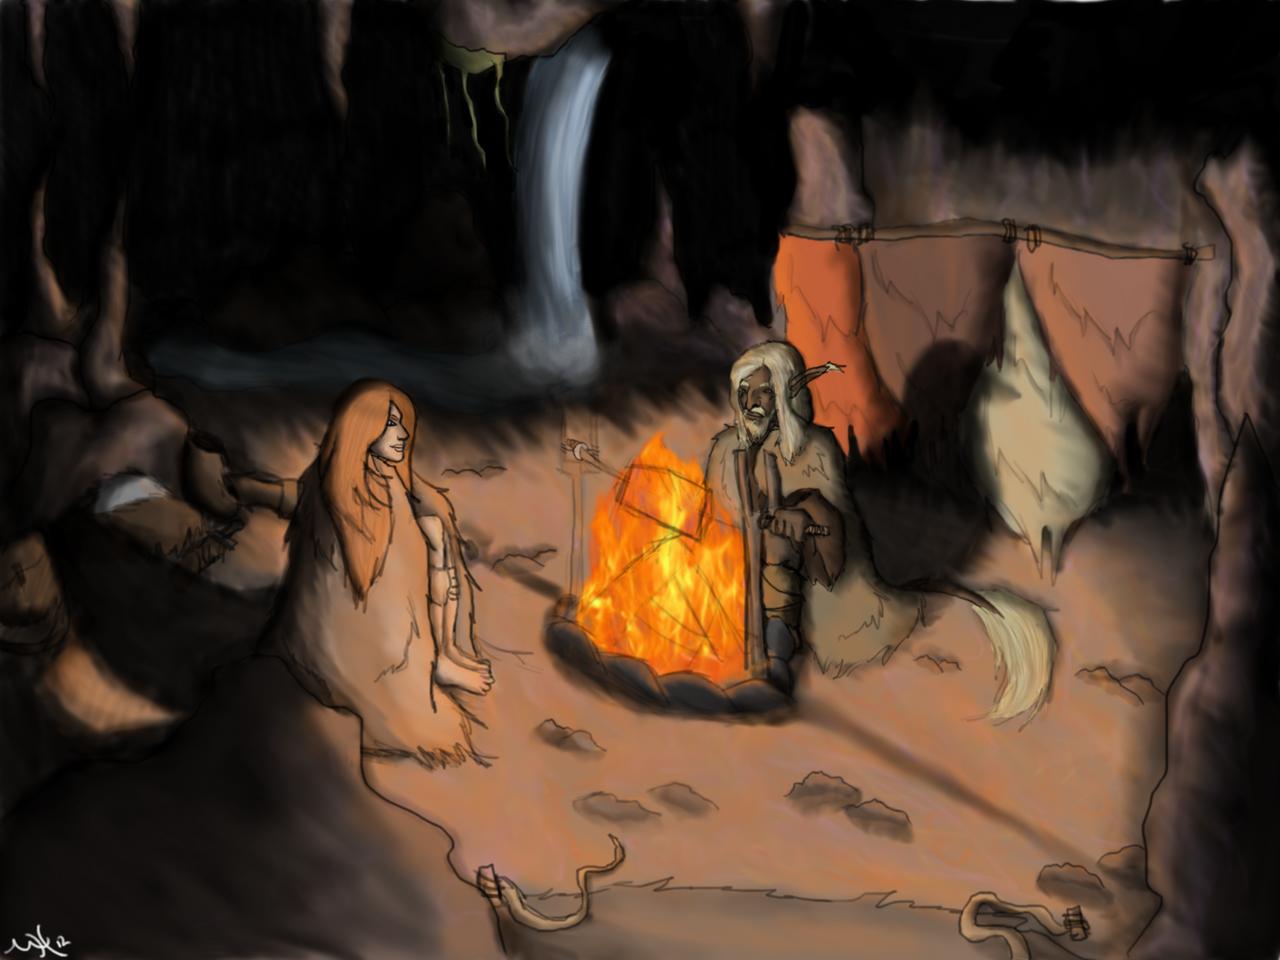 Firelight by Markus-The-Madman